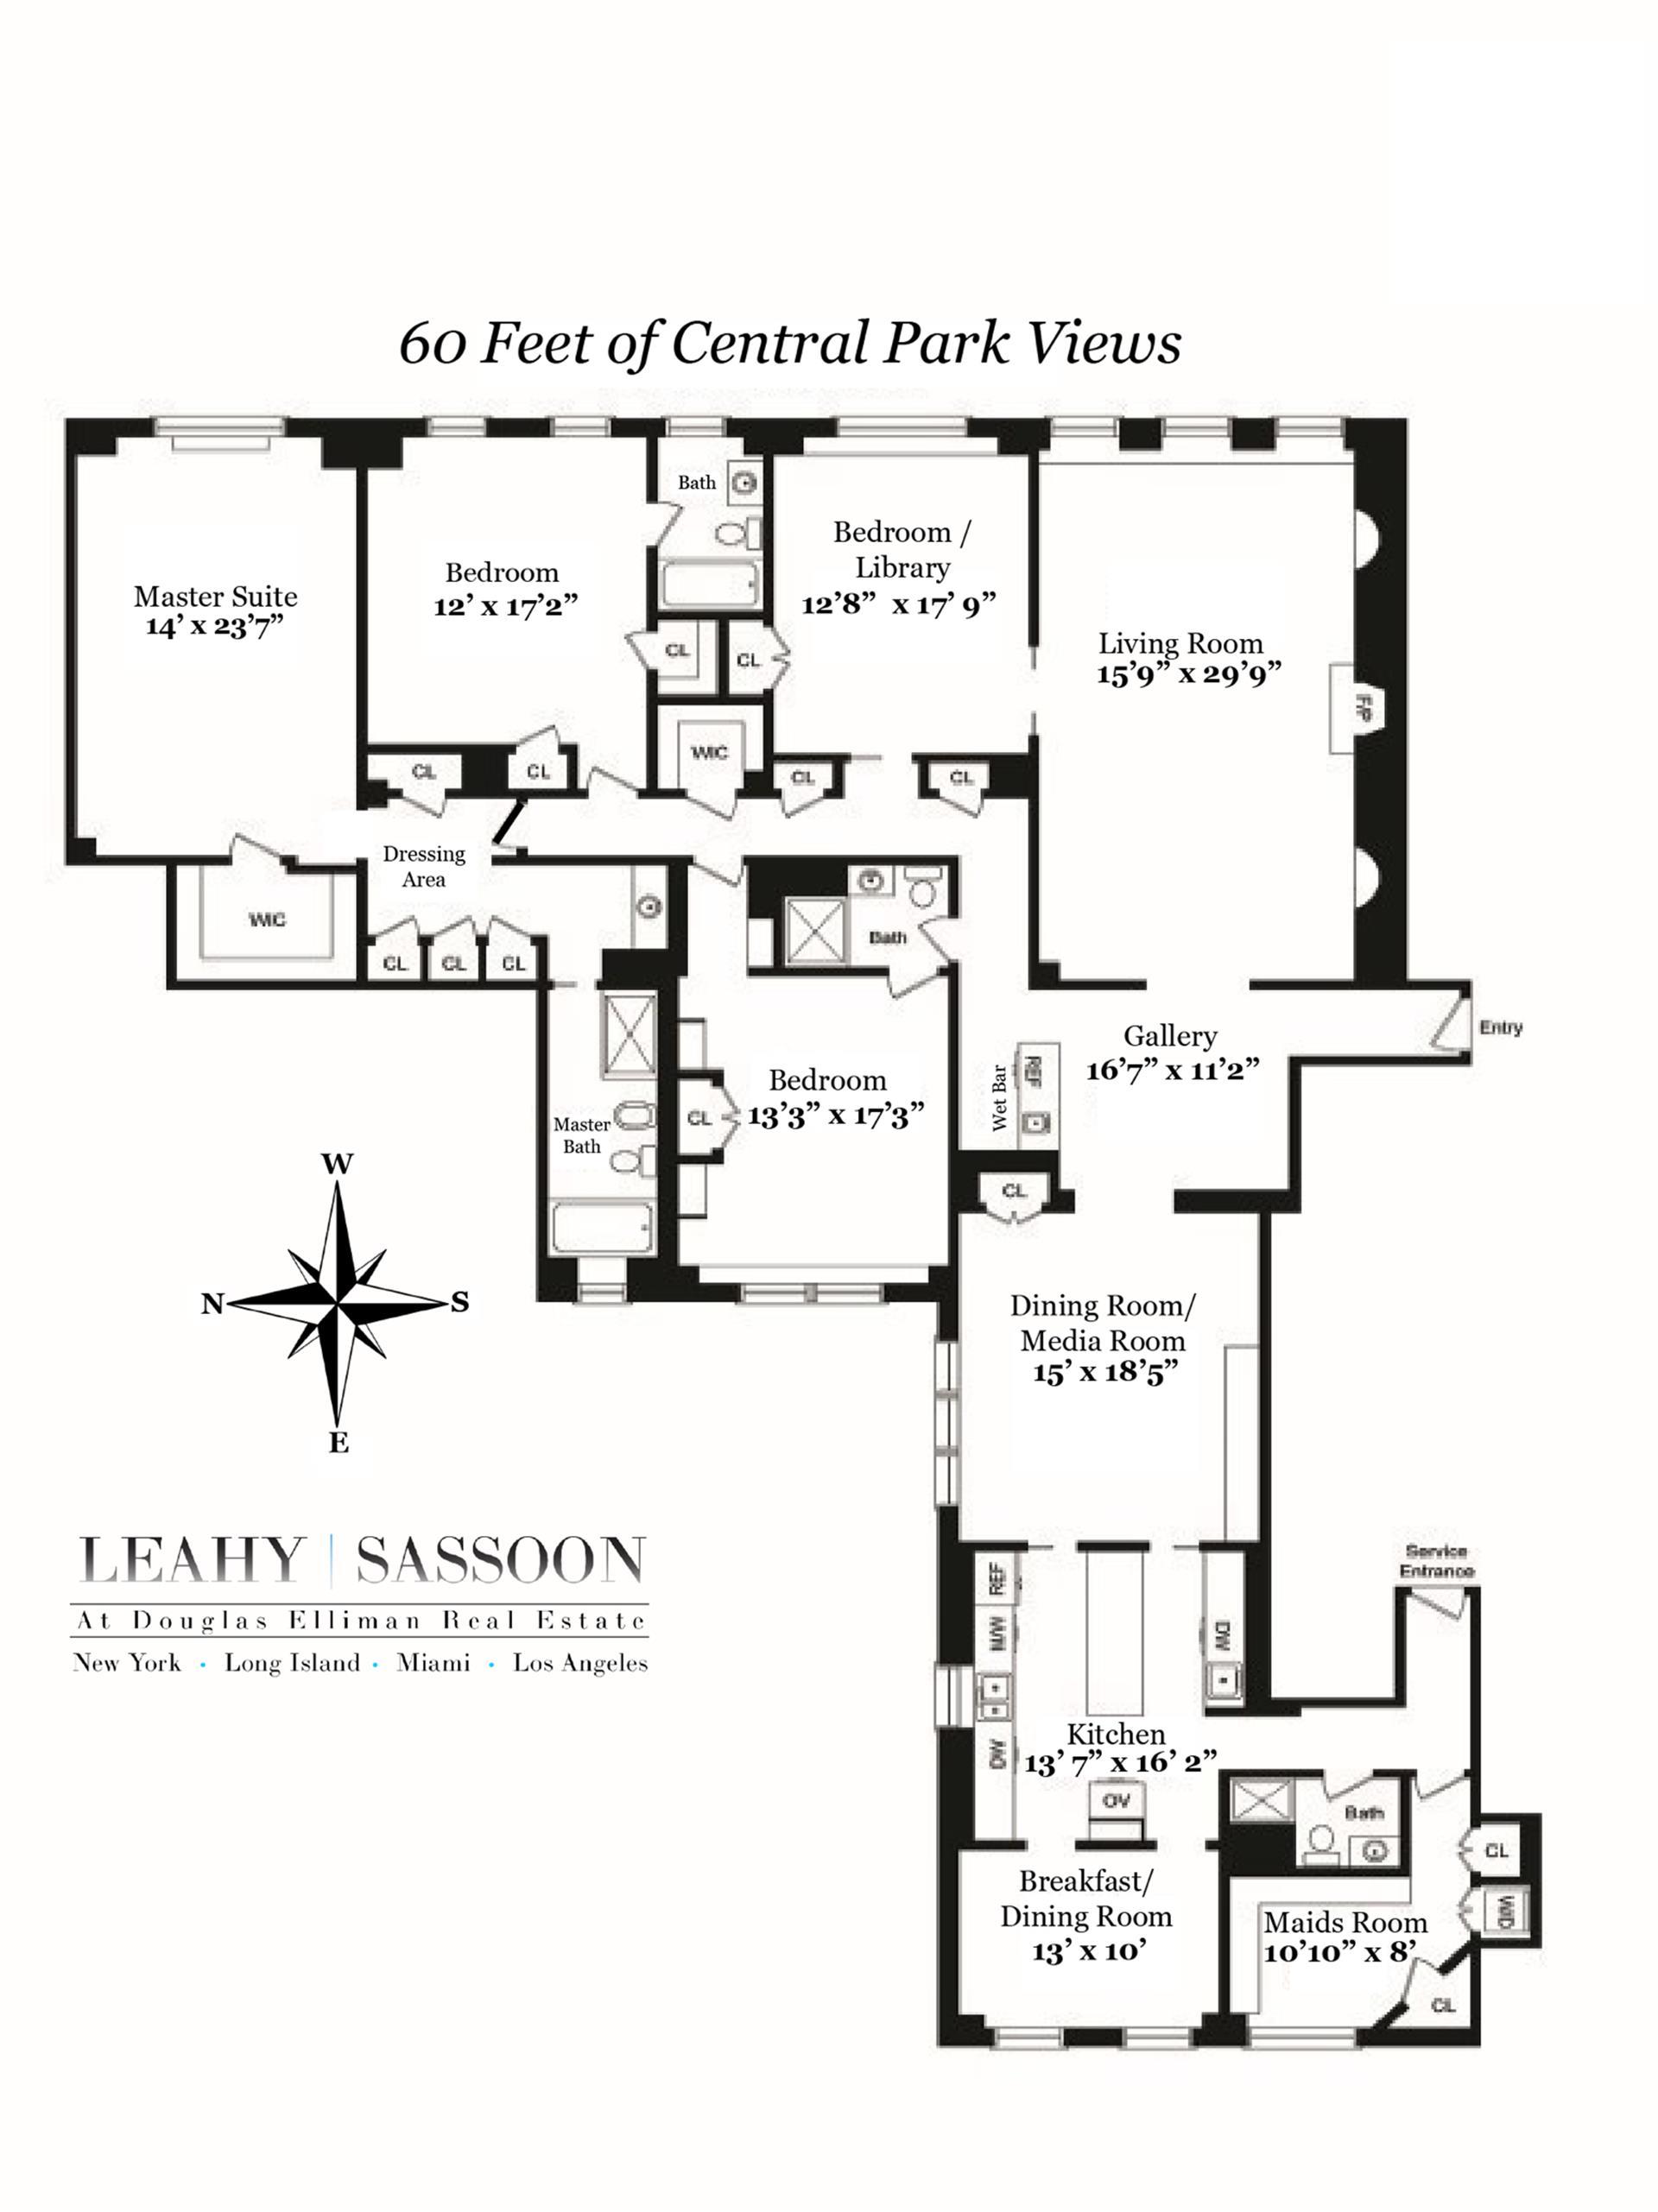 Floor plan of 101 Central Park West, 10E - Upper West Side, New York